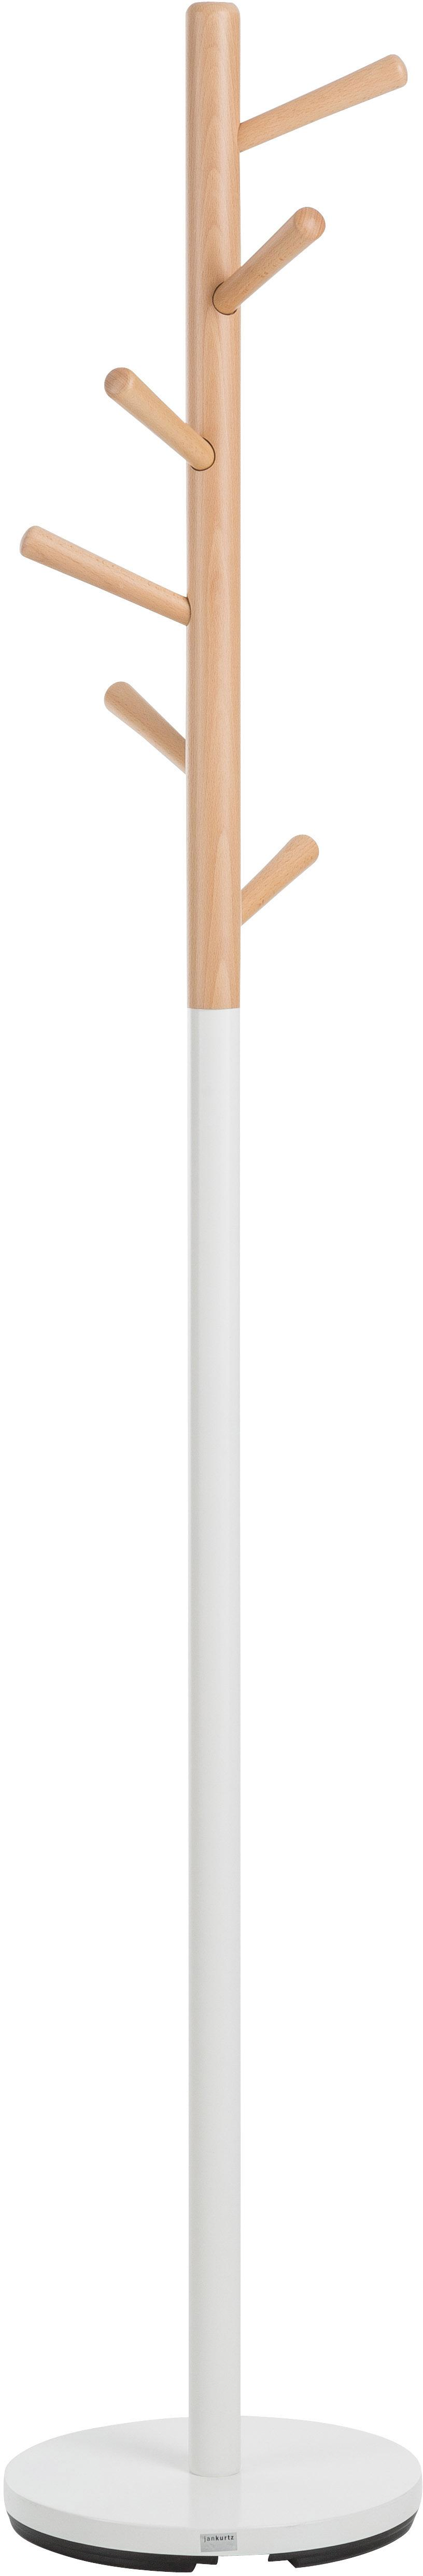 Appendiabiti Kent, Bianco, faggio, Ø 32 x Alt. 182 cm